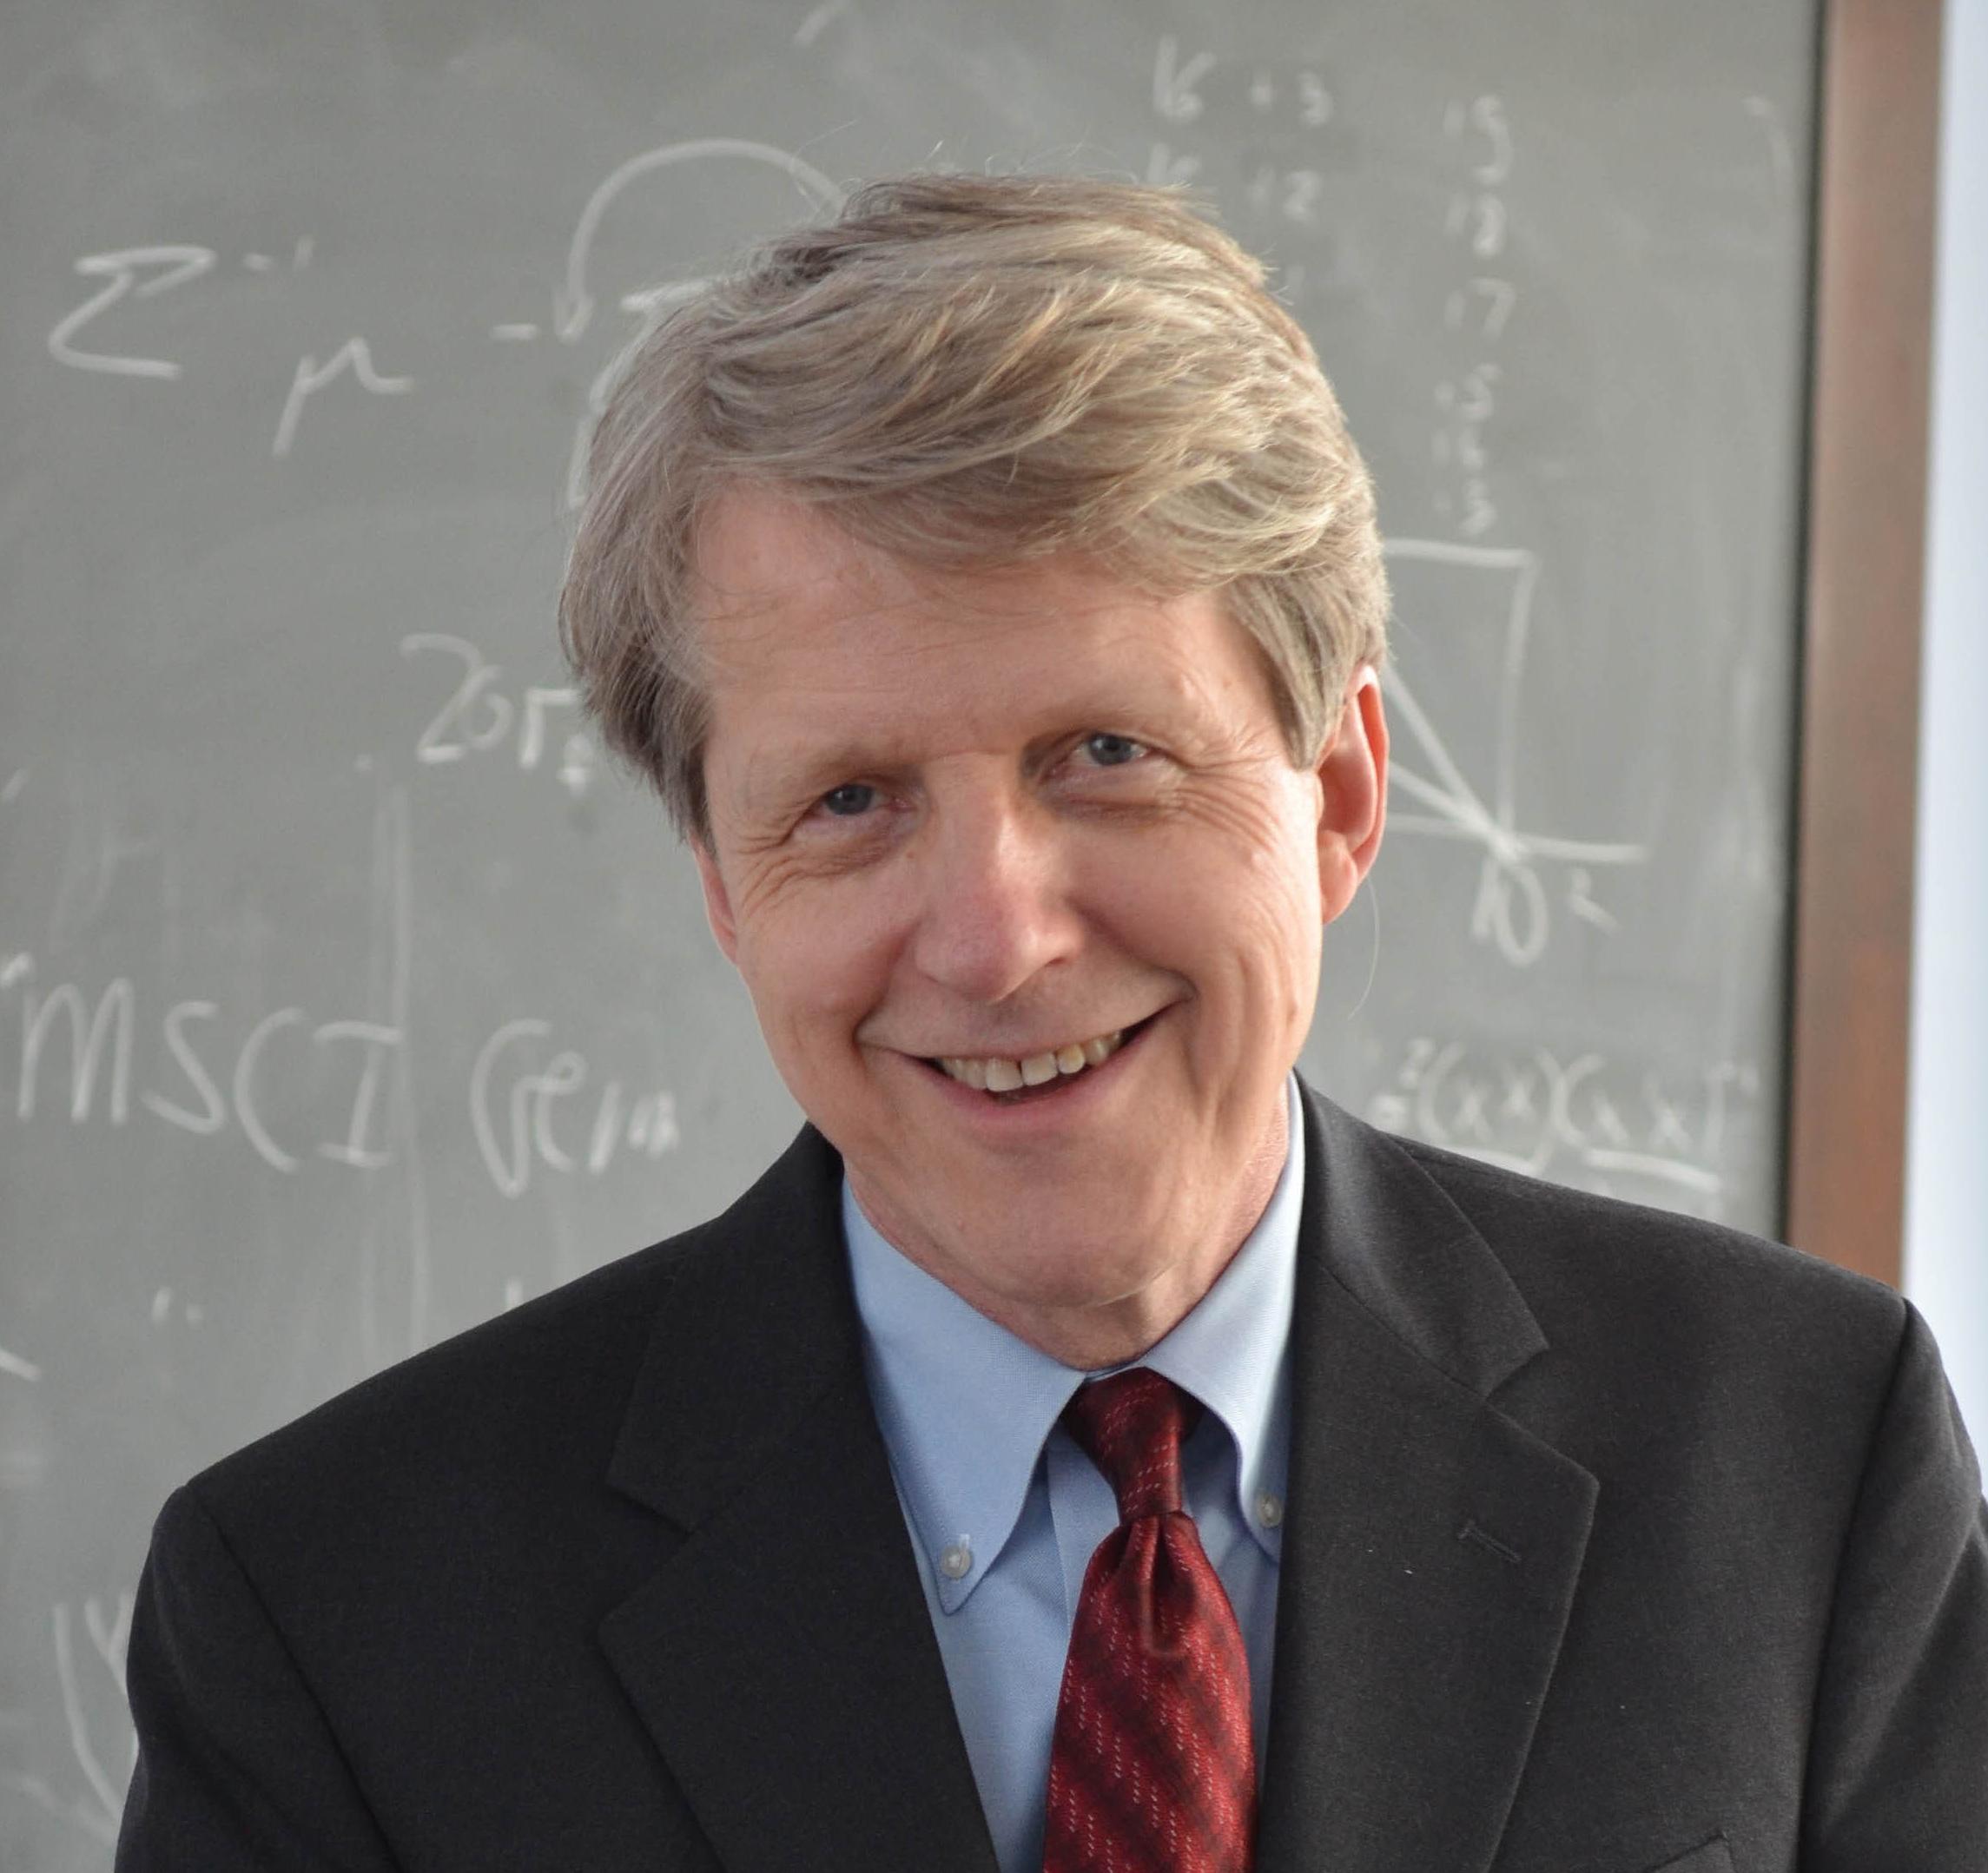 البروفيسور روبرت شيلر